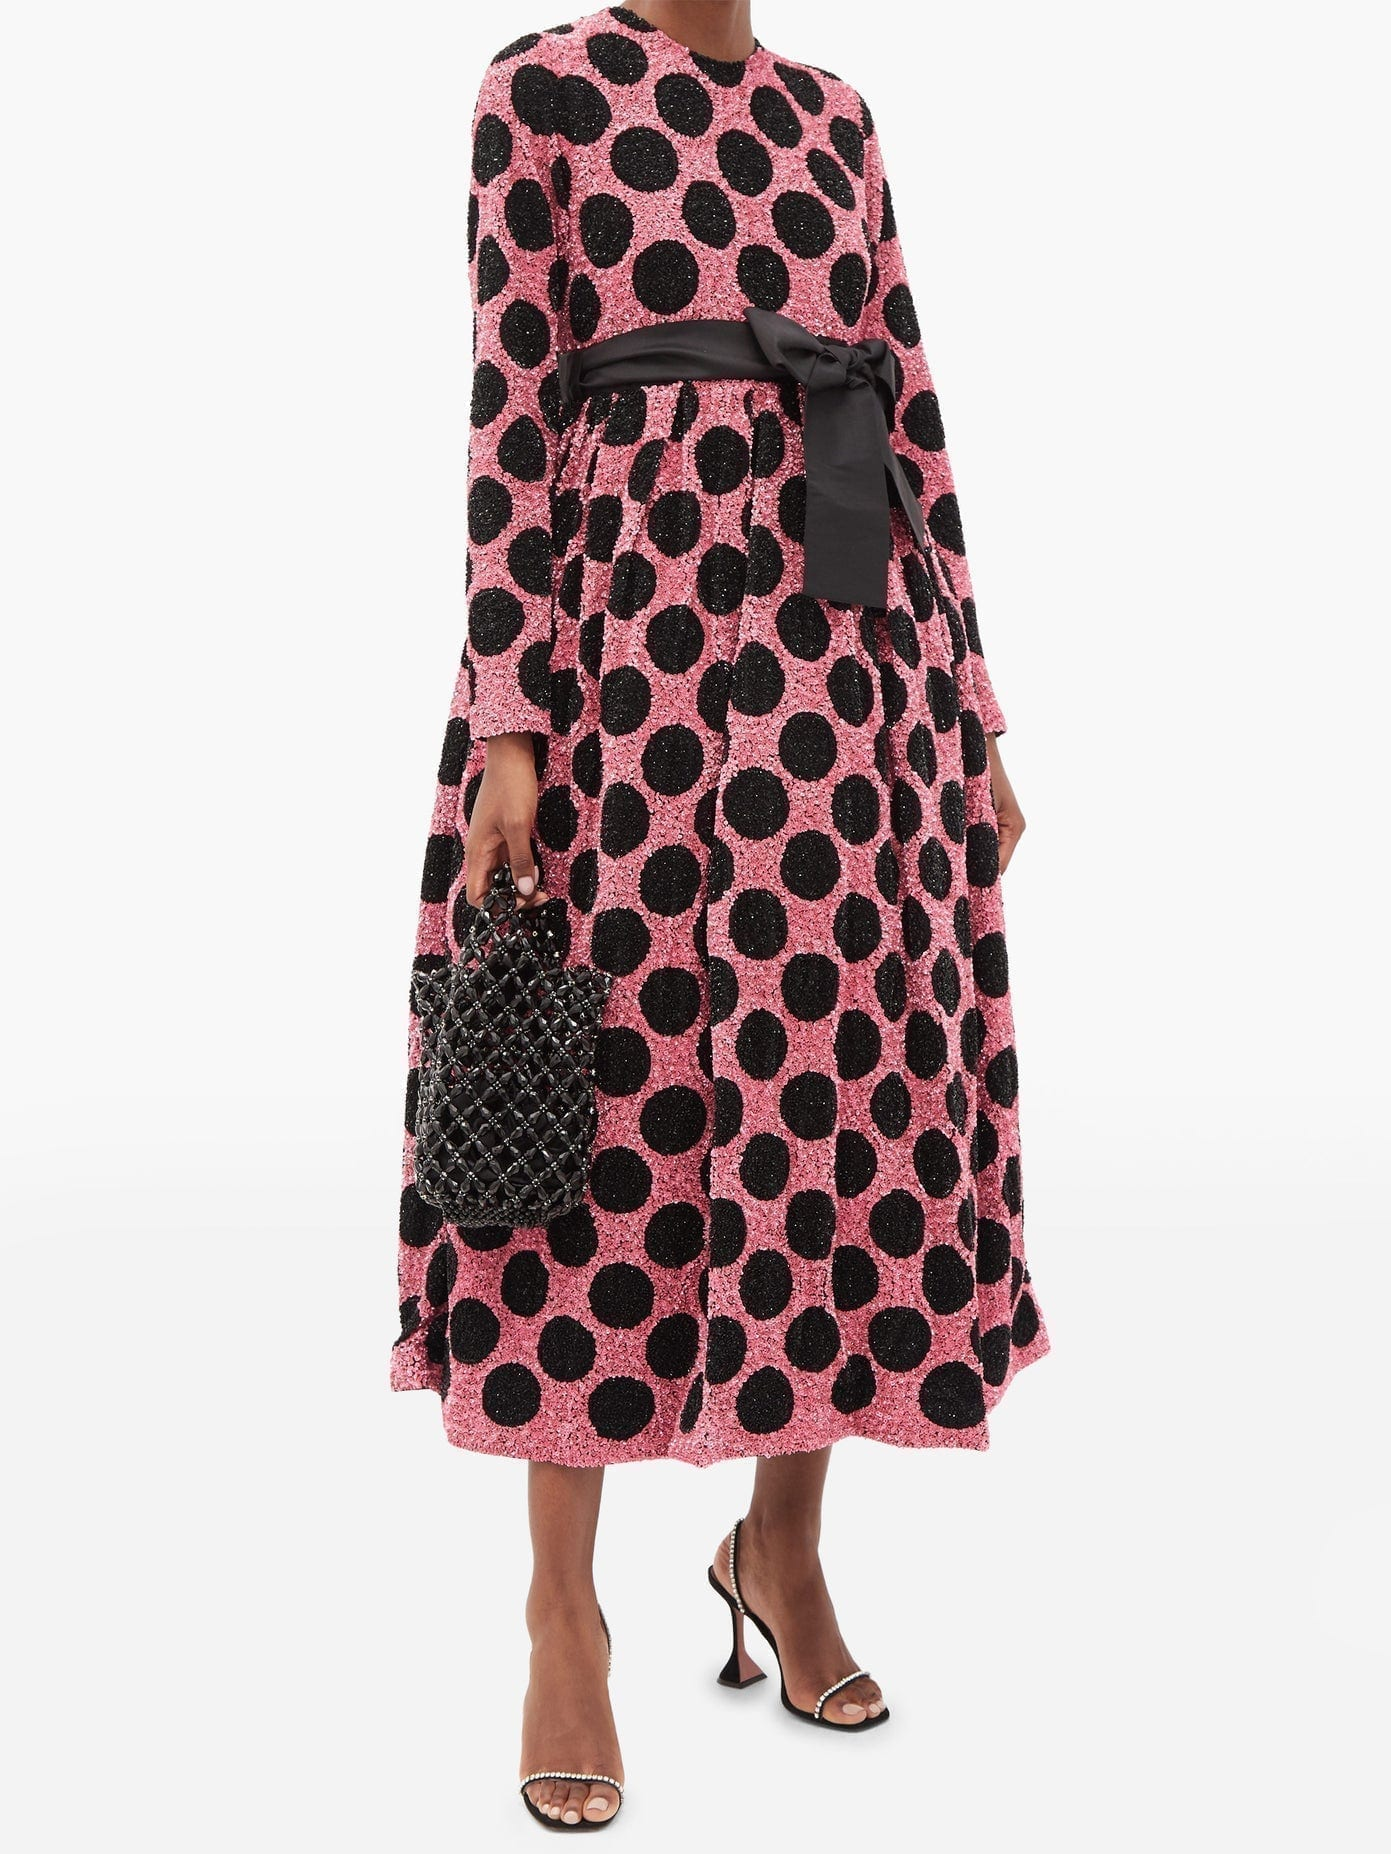 ASHISH Polka-dot Waist-sash Sequined Midi Dress